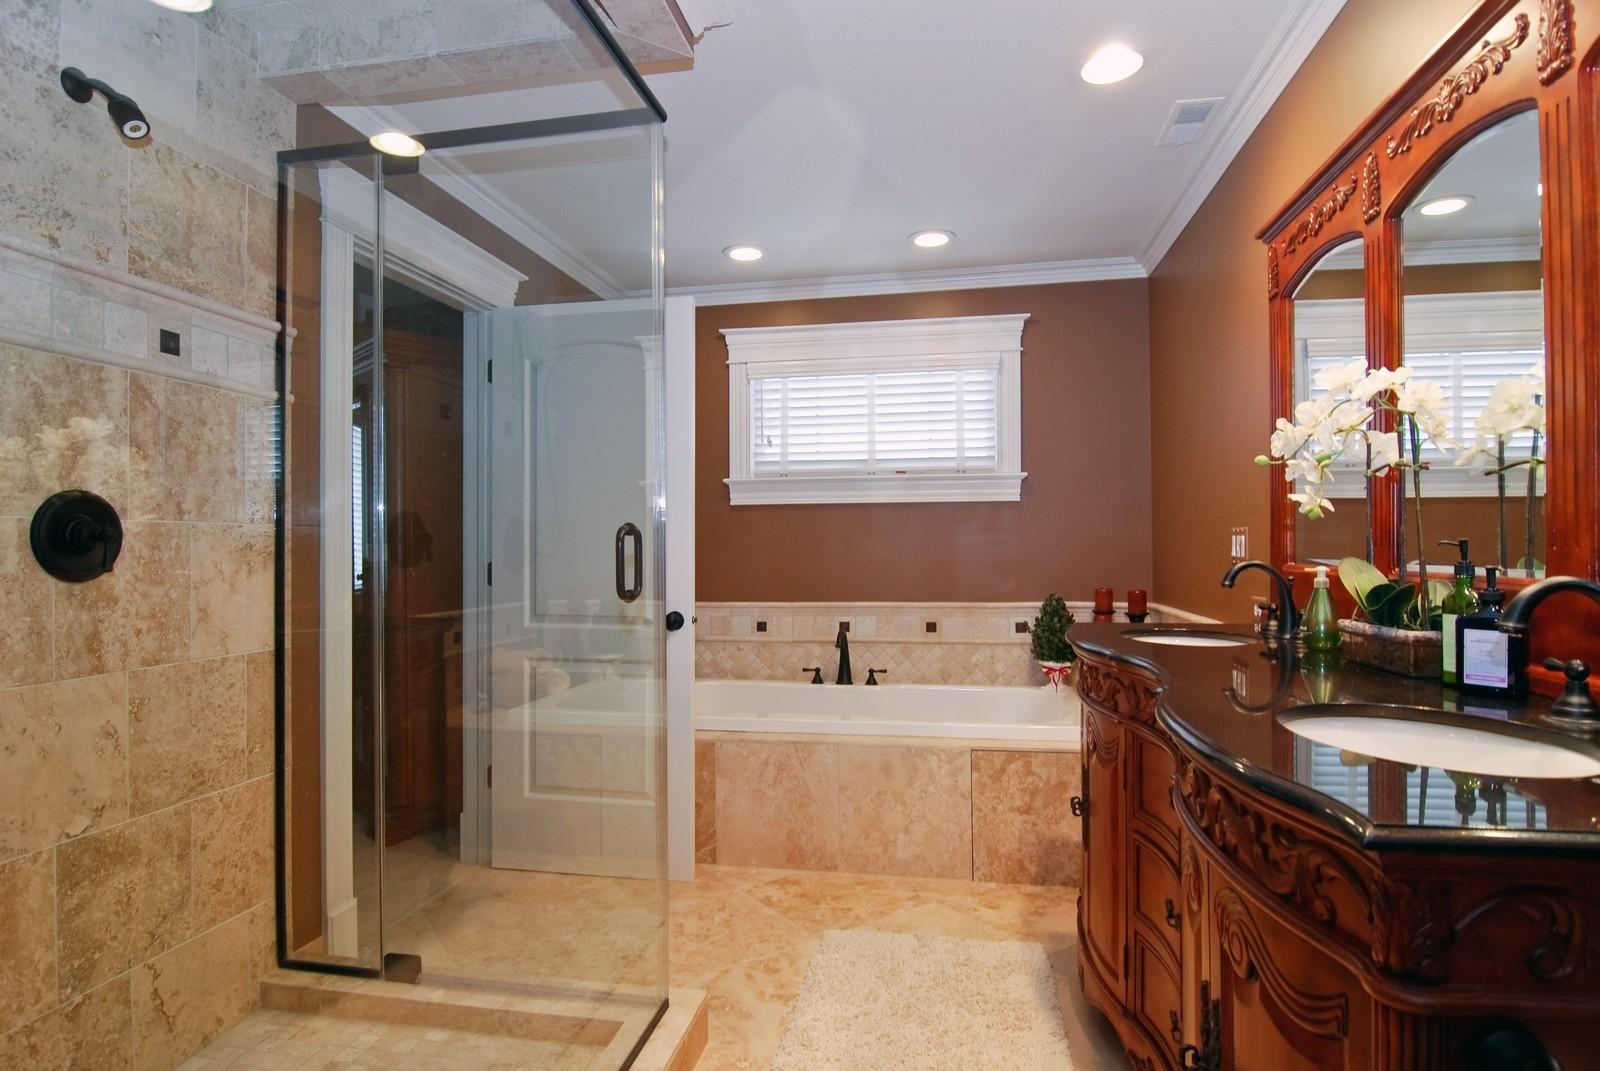 Real Estate Photography - 1064 Cherry Lane, Beecher, IL, 60401 - Master Bathroom